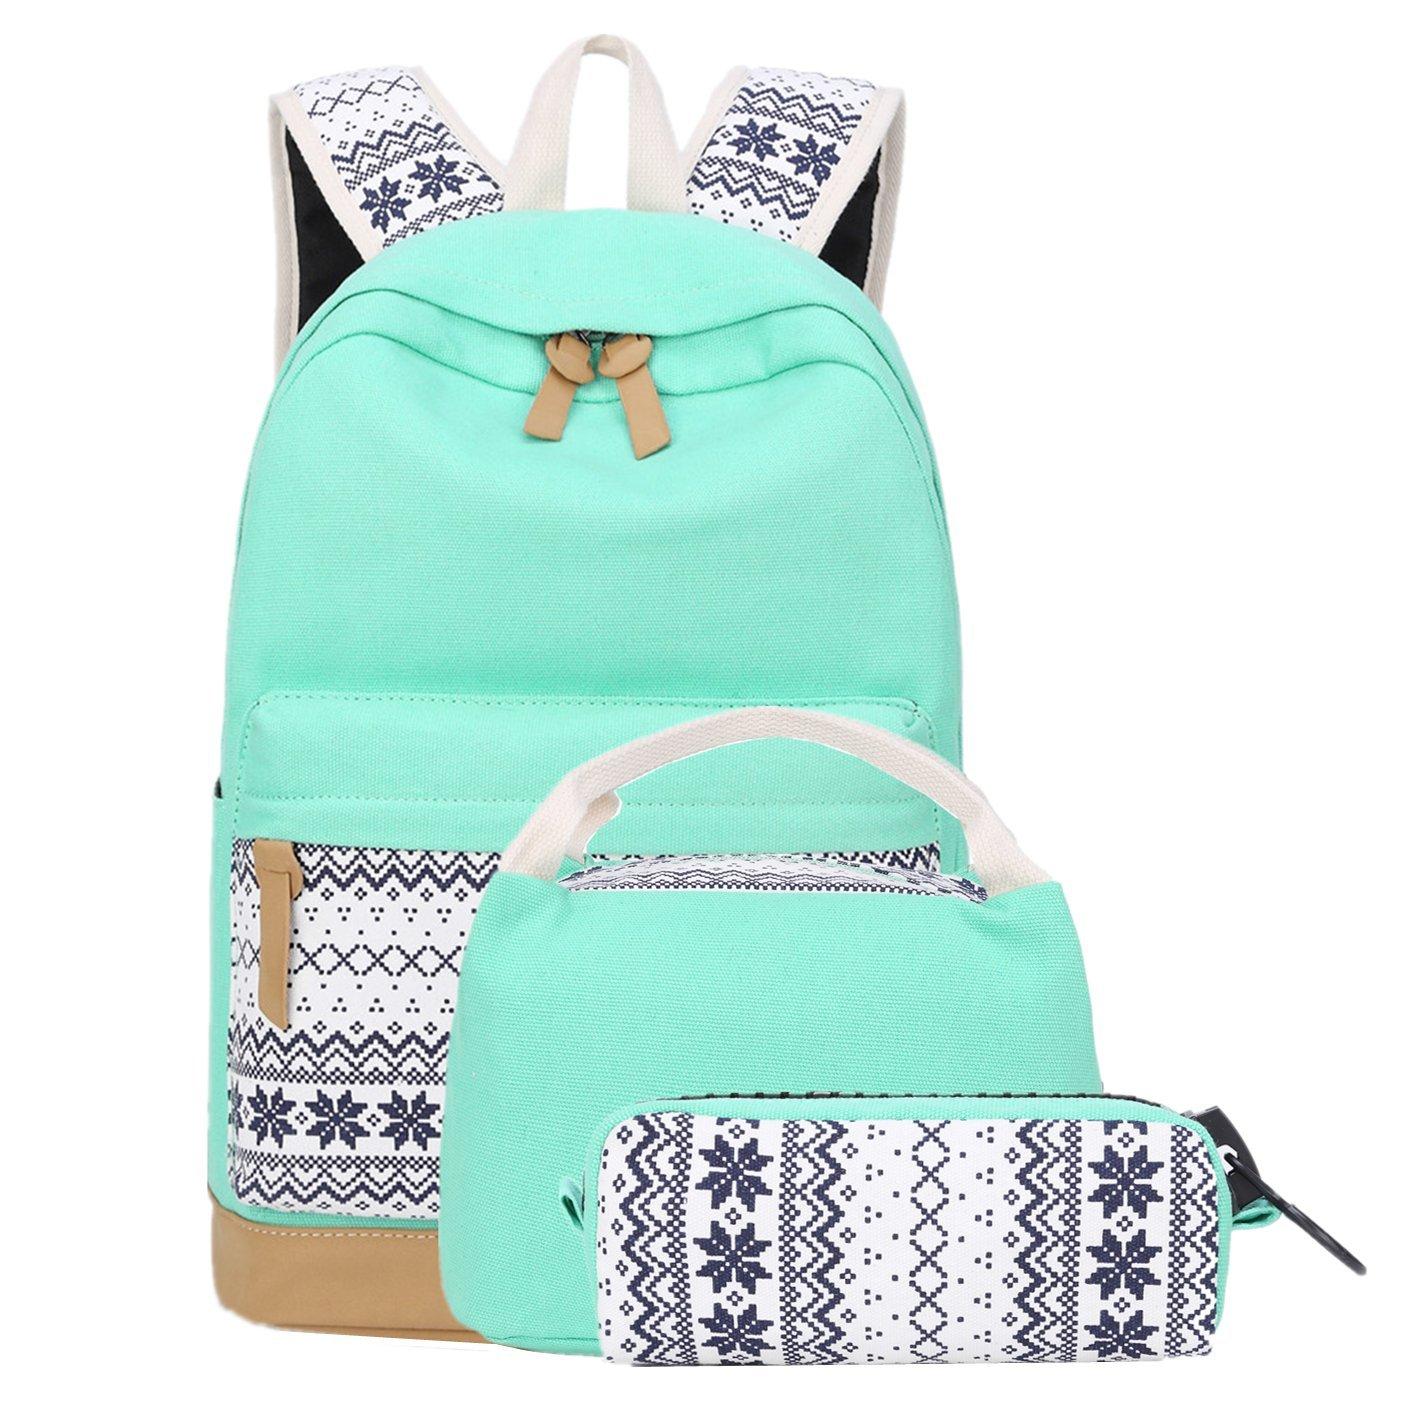 ad50216f8750 Galleon - School Backpacks For Teen Girls Lightweight Canvas Backpack  Bookbags Set (Light Green)